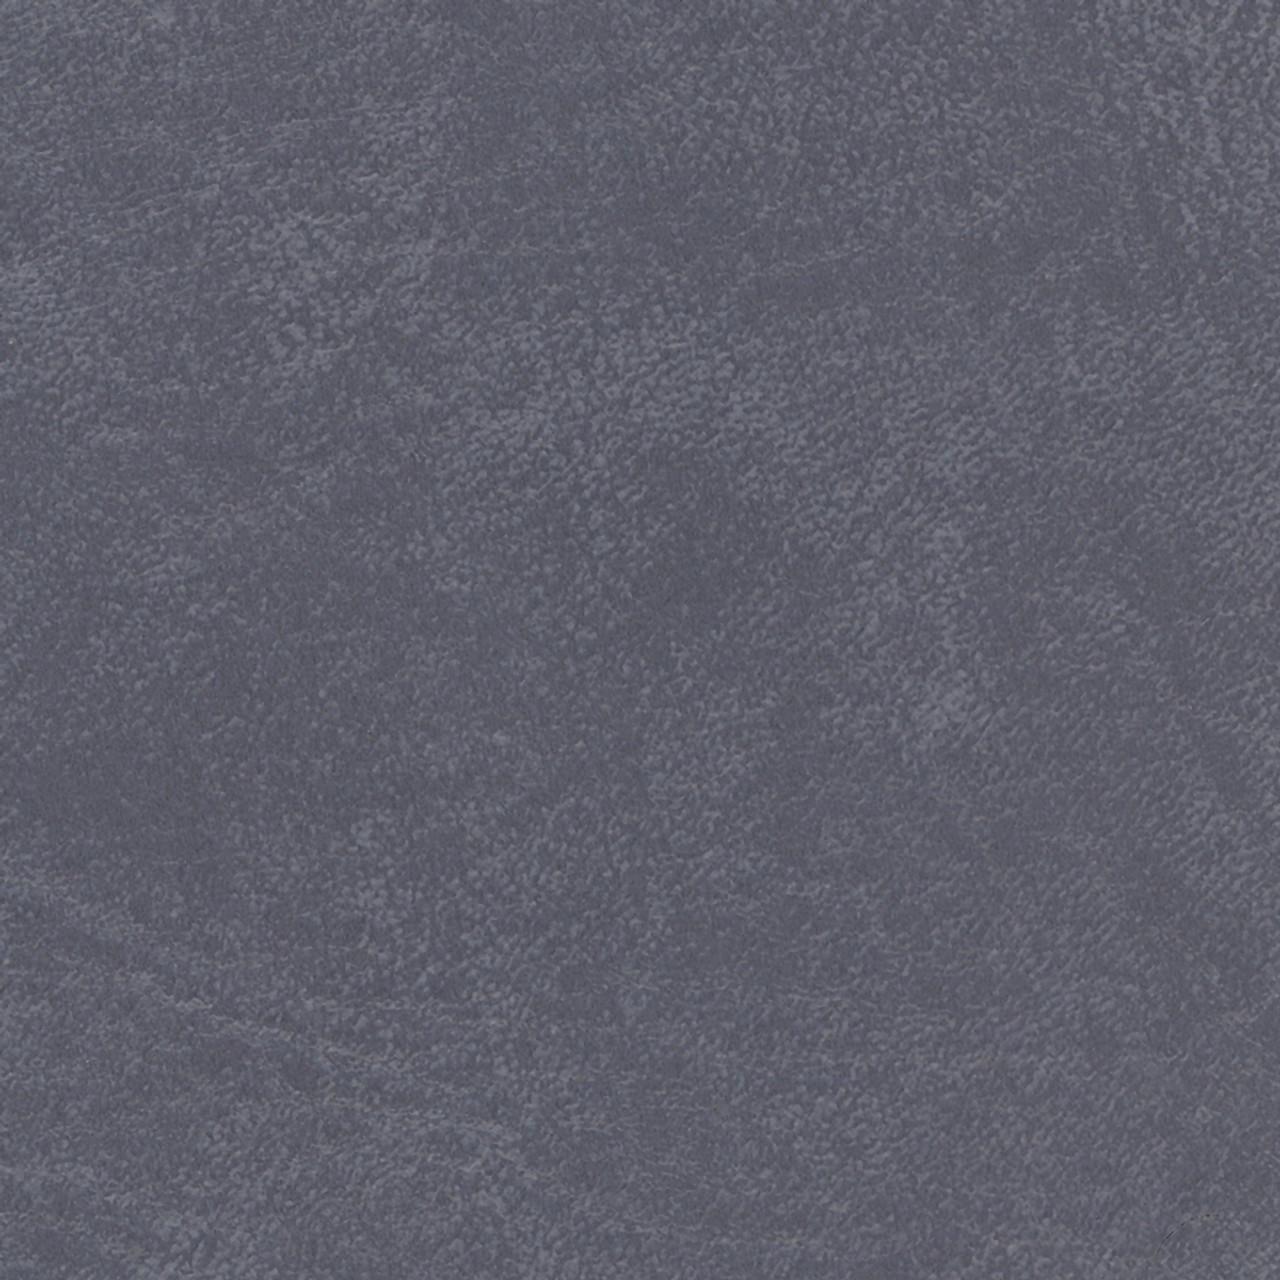 Seabreeze SEA-854 Twilight